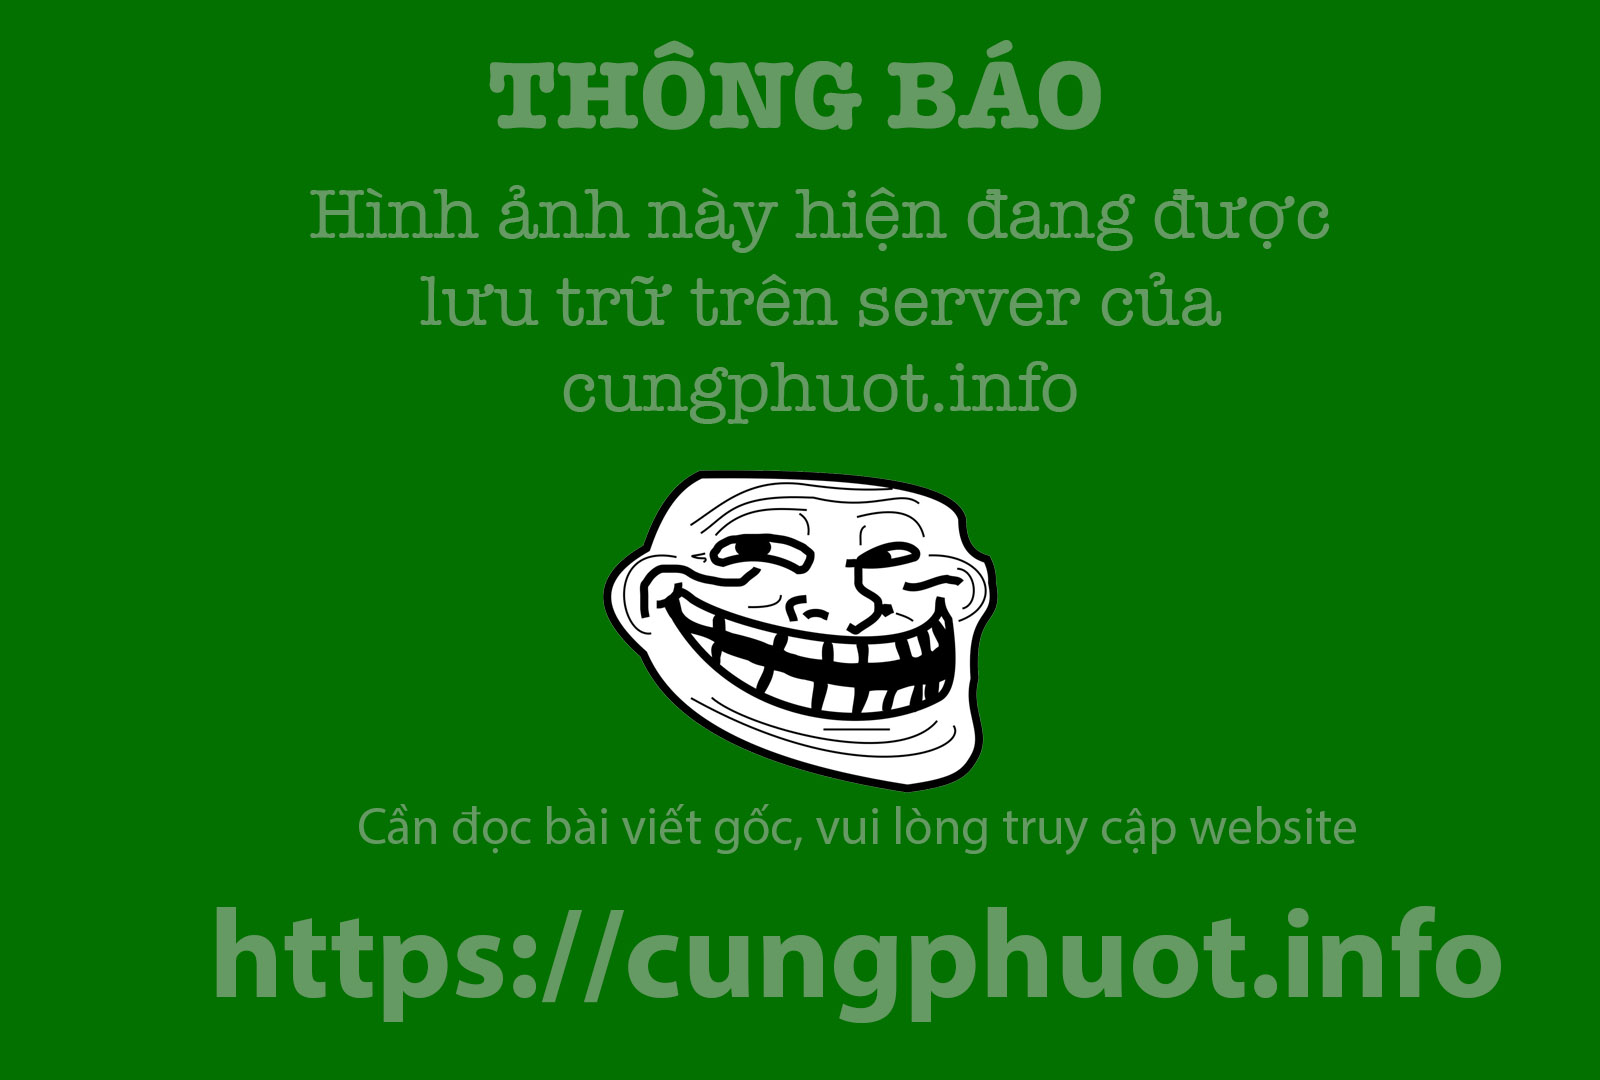 Vuon hoa tam giac mach o Ninh Binh hinh anh 6